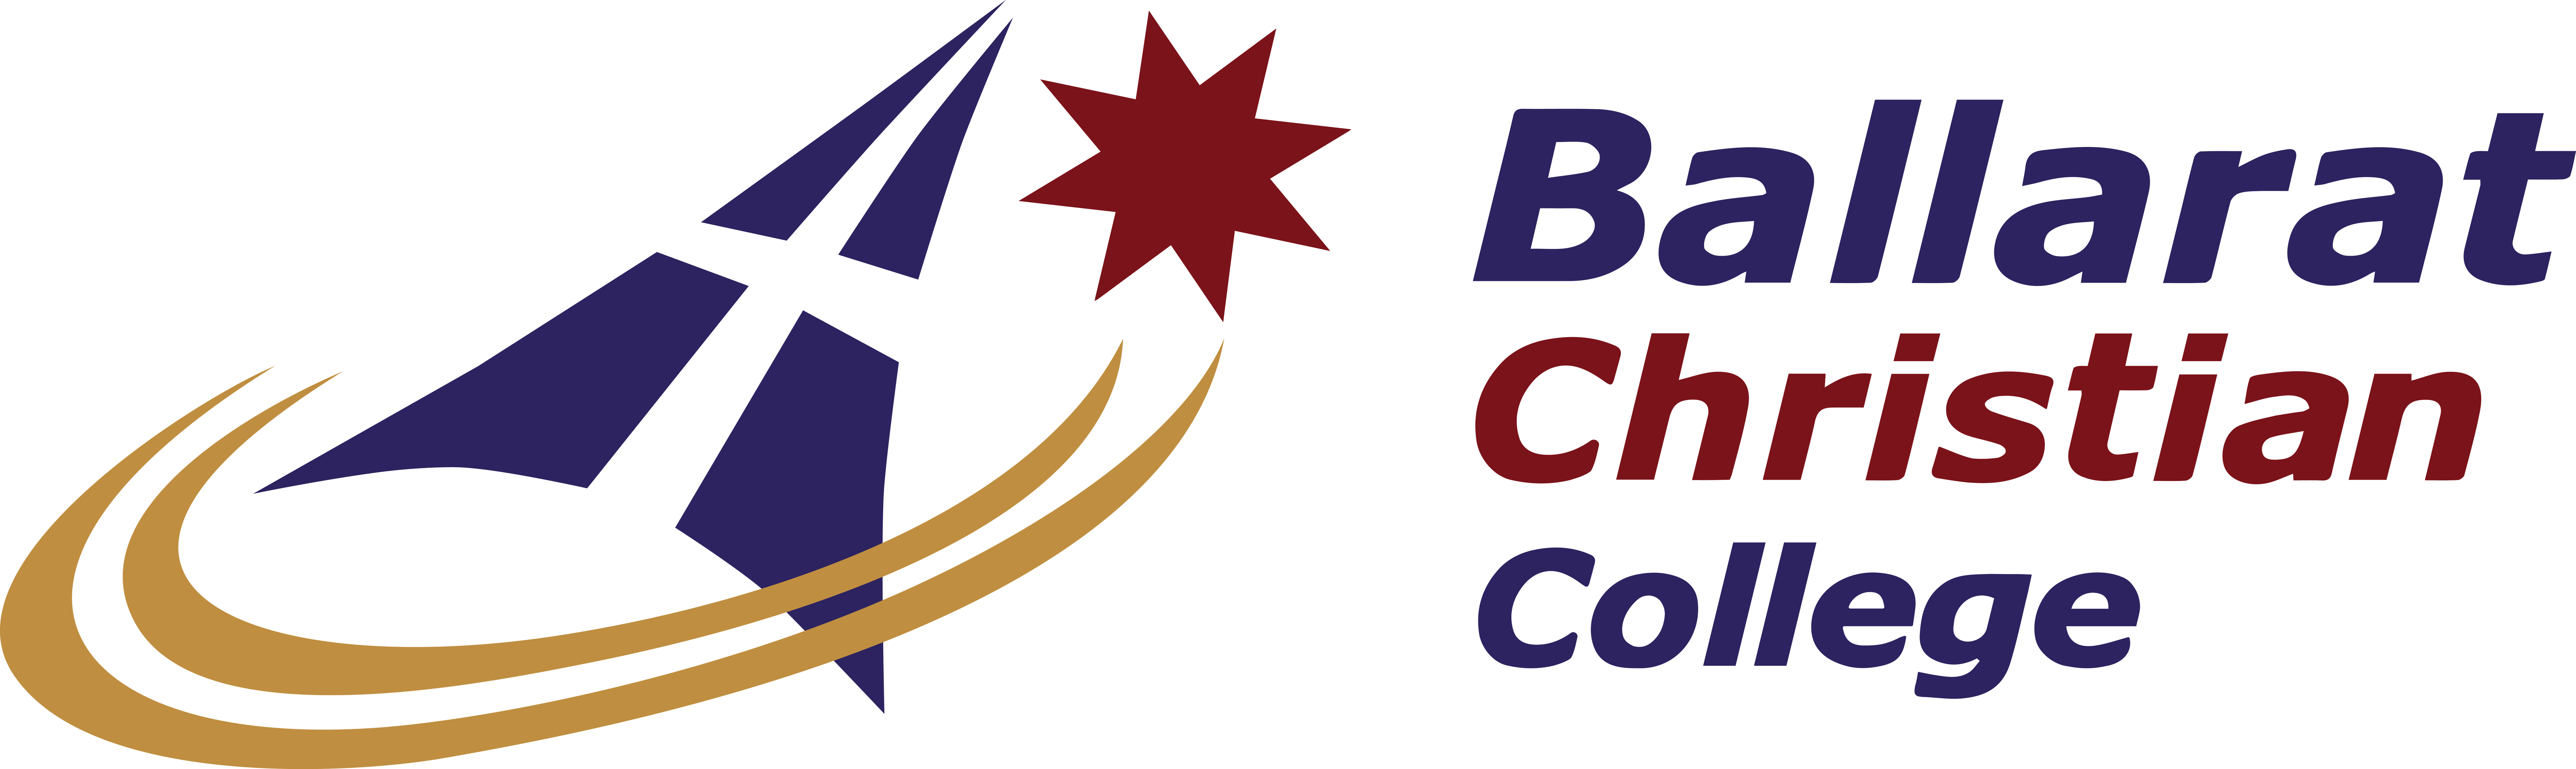 Ballarat Christian College